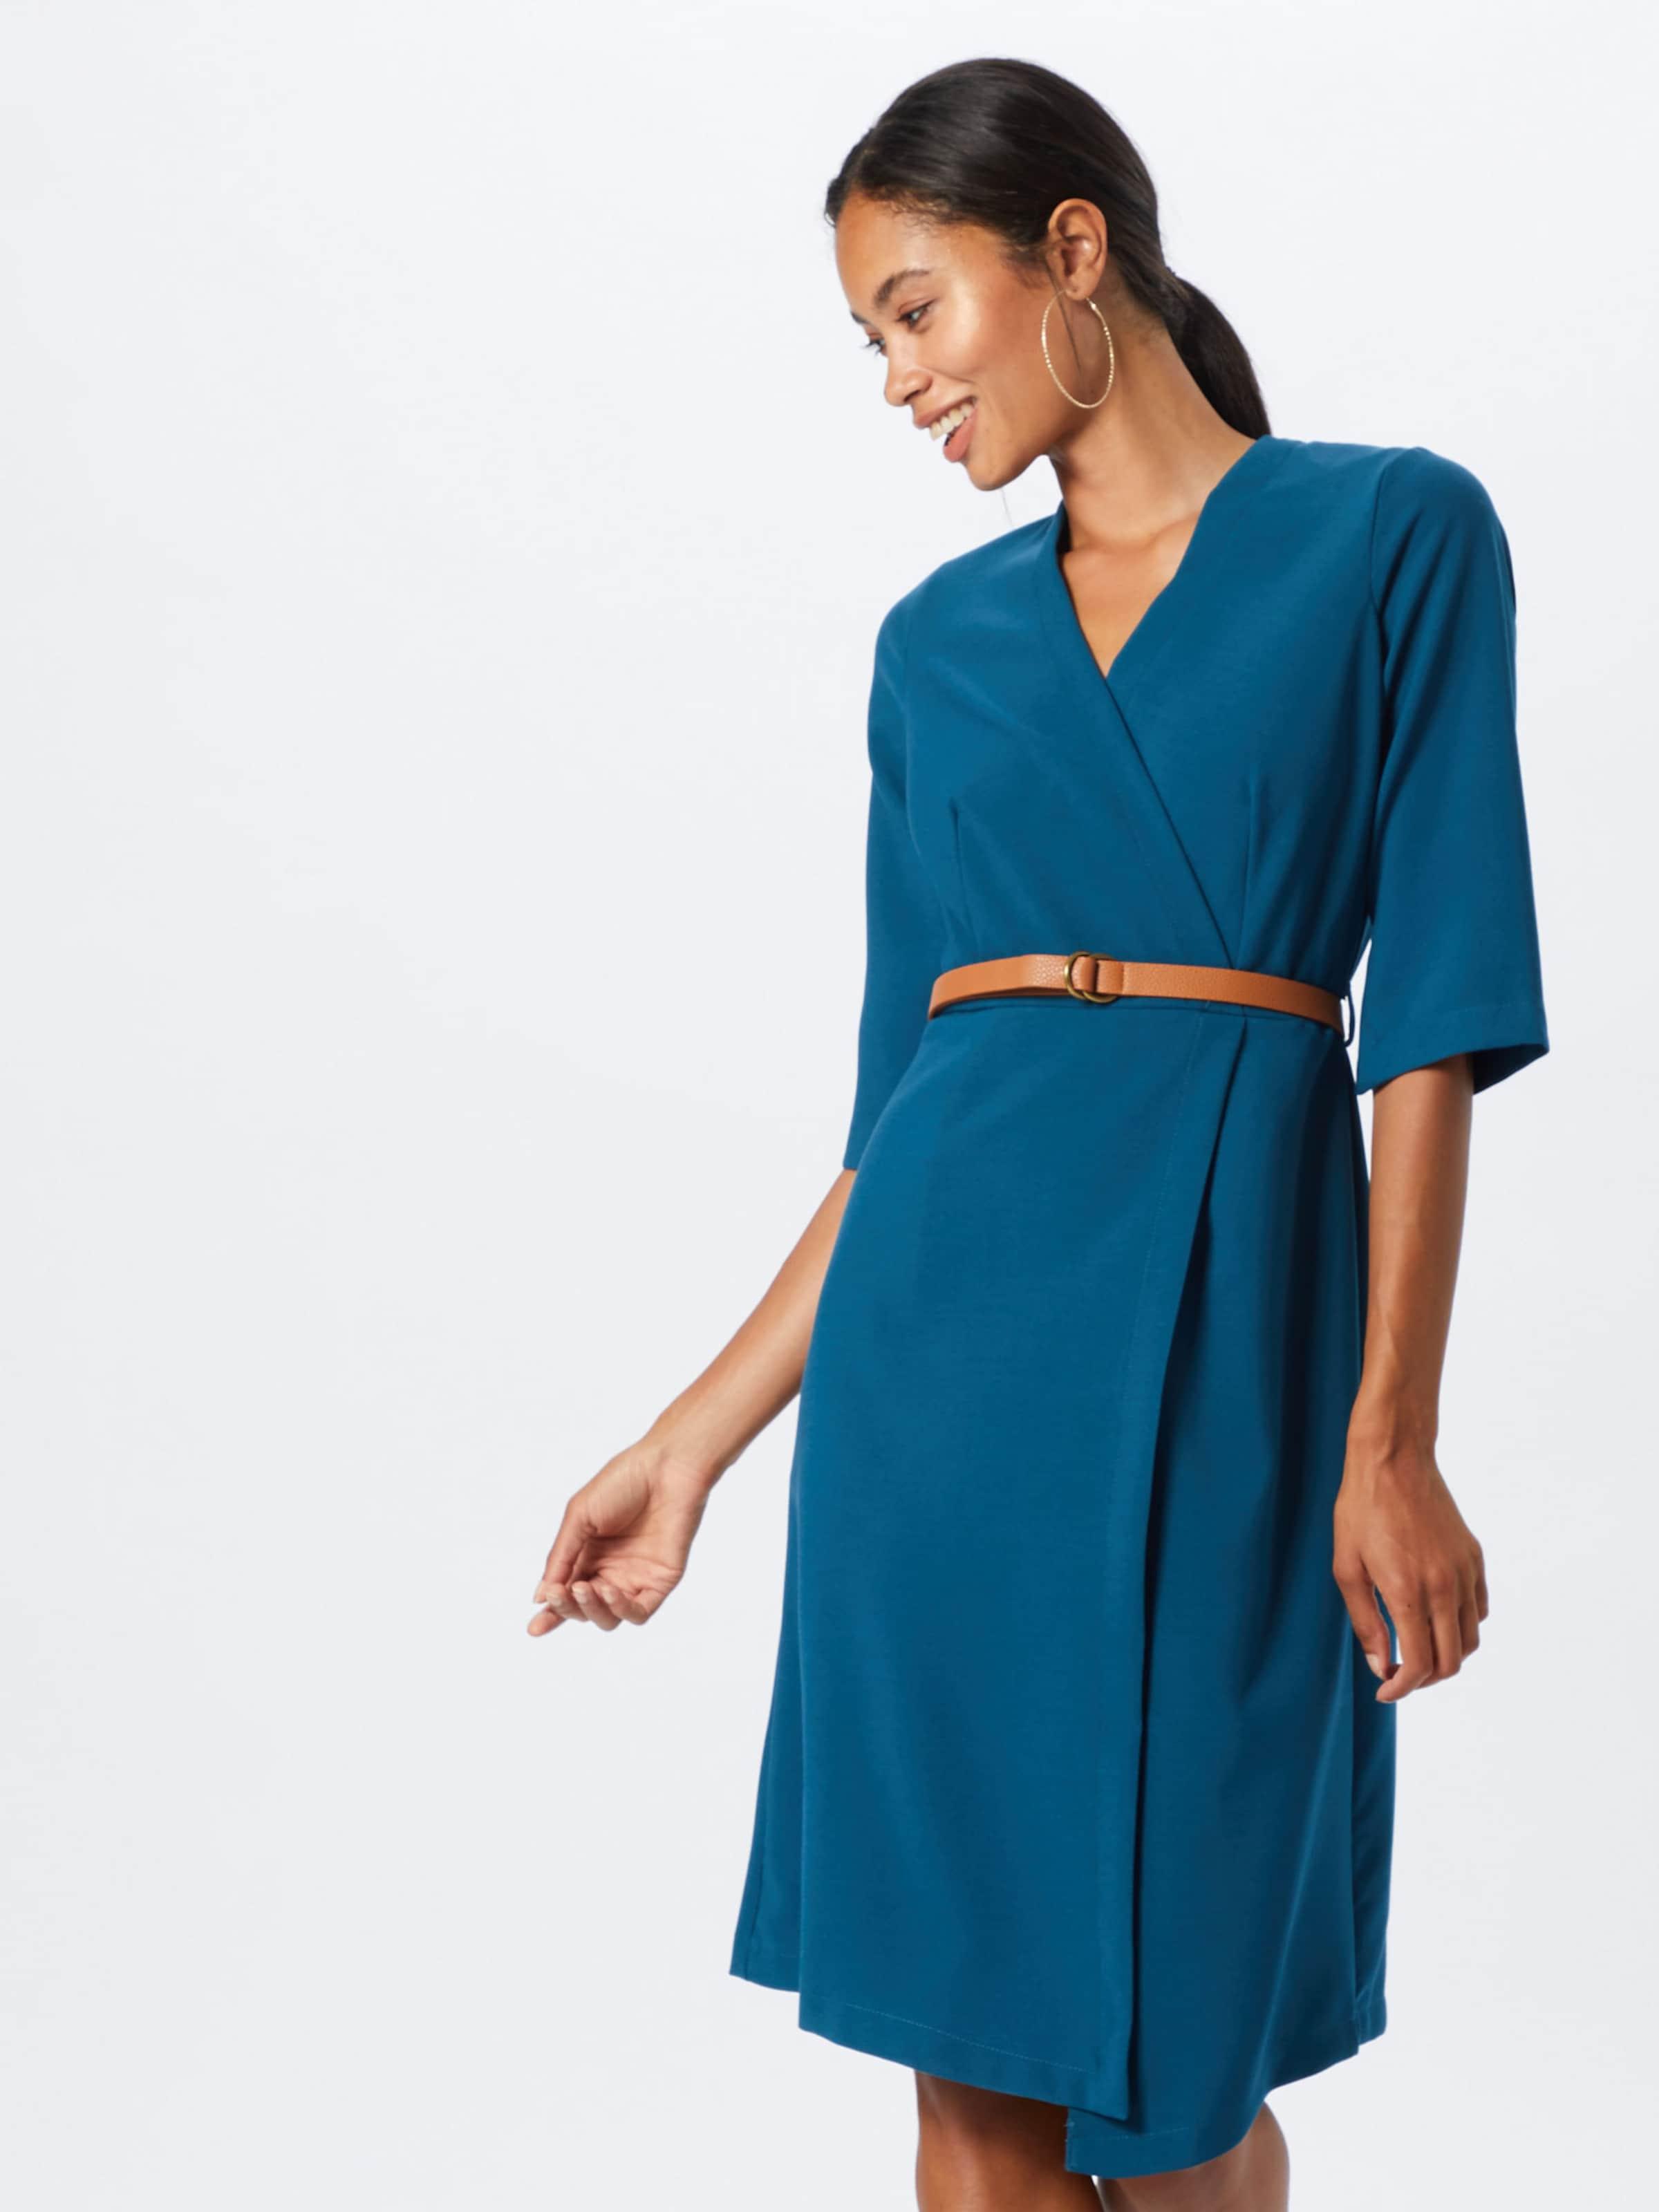 In Closet Closet London Kleid Blau trCsQhd